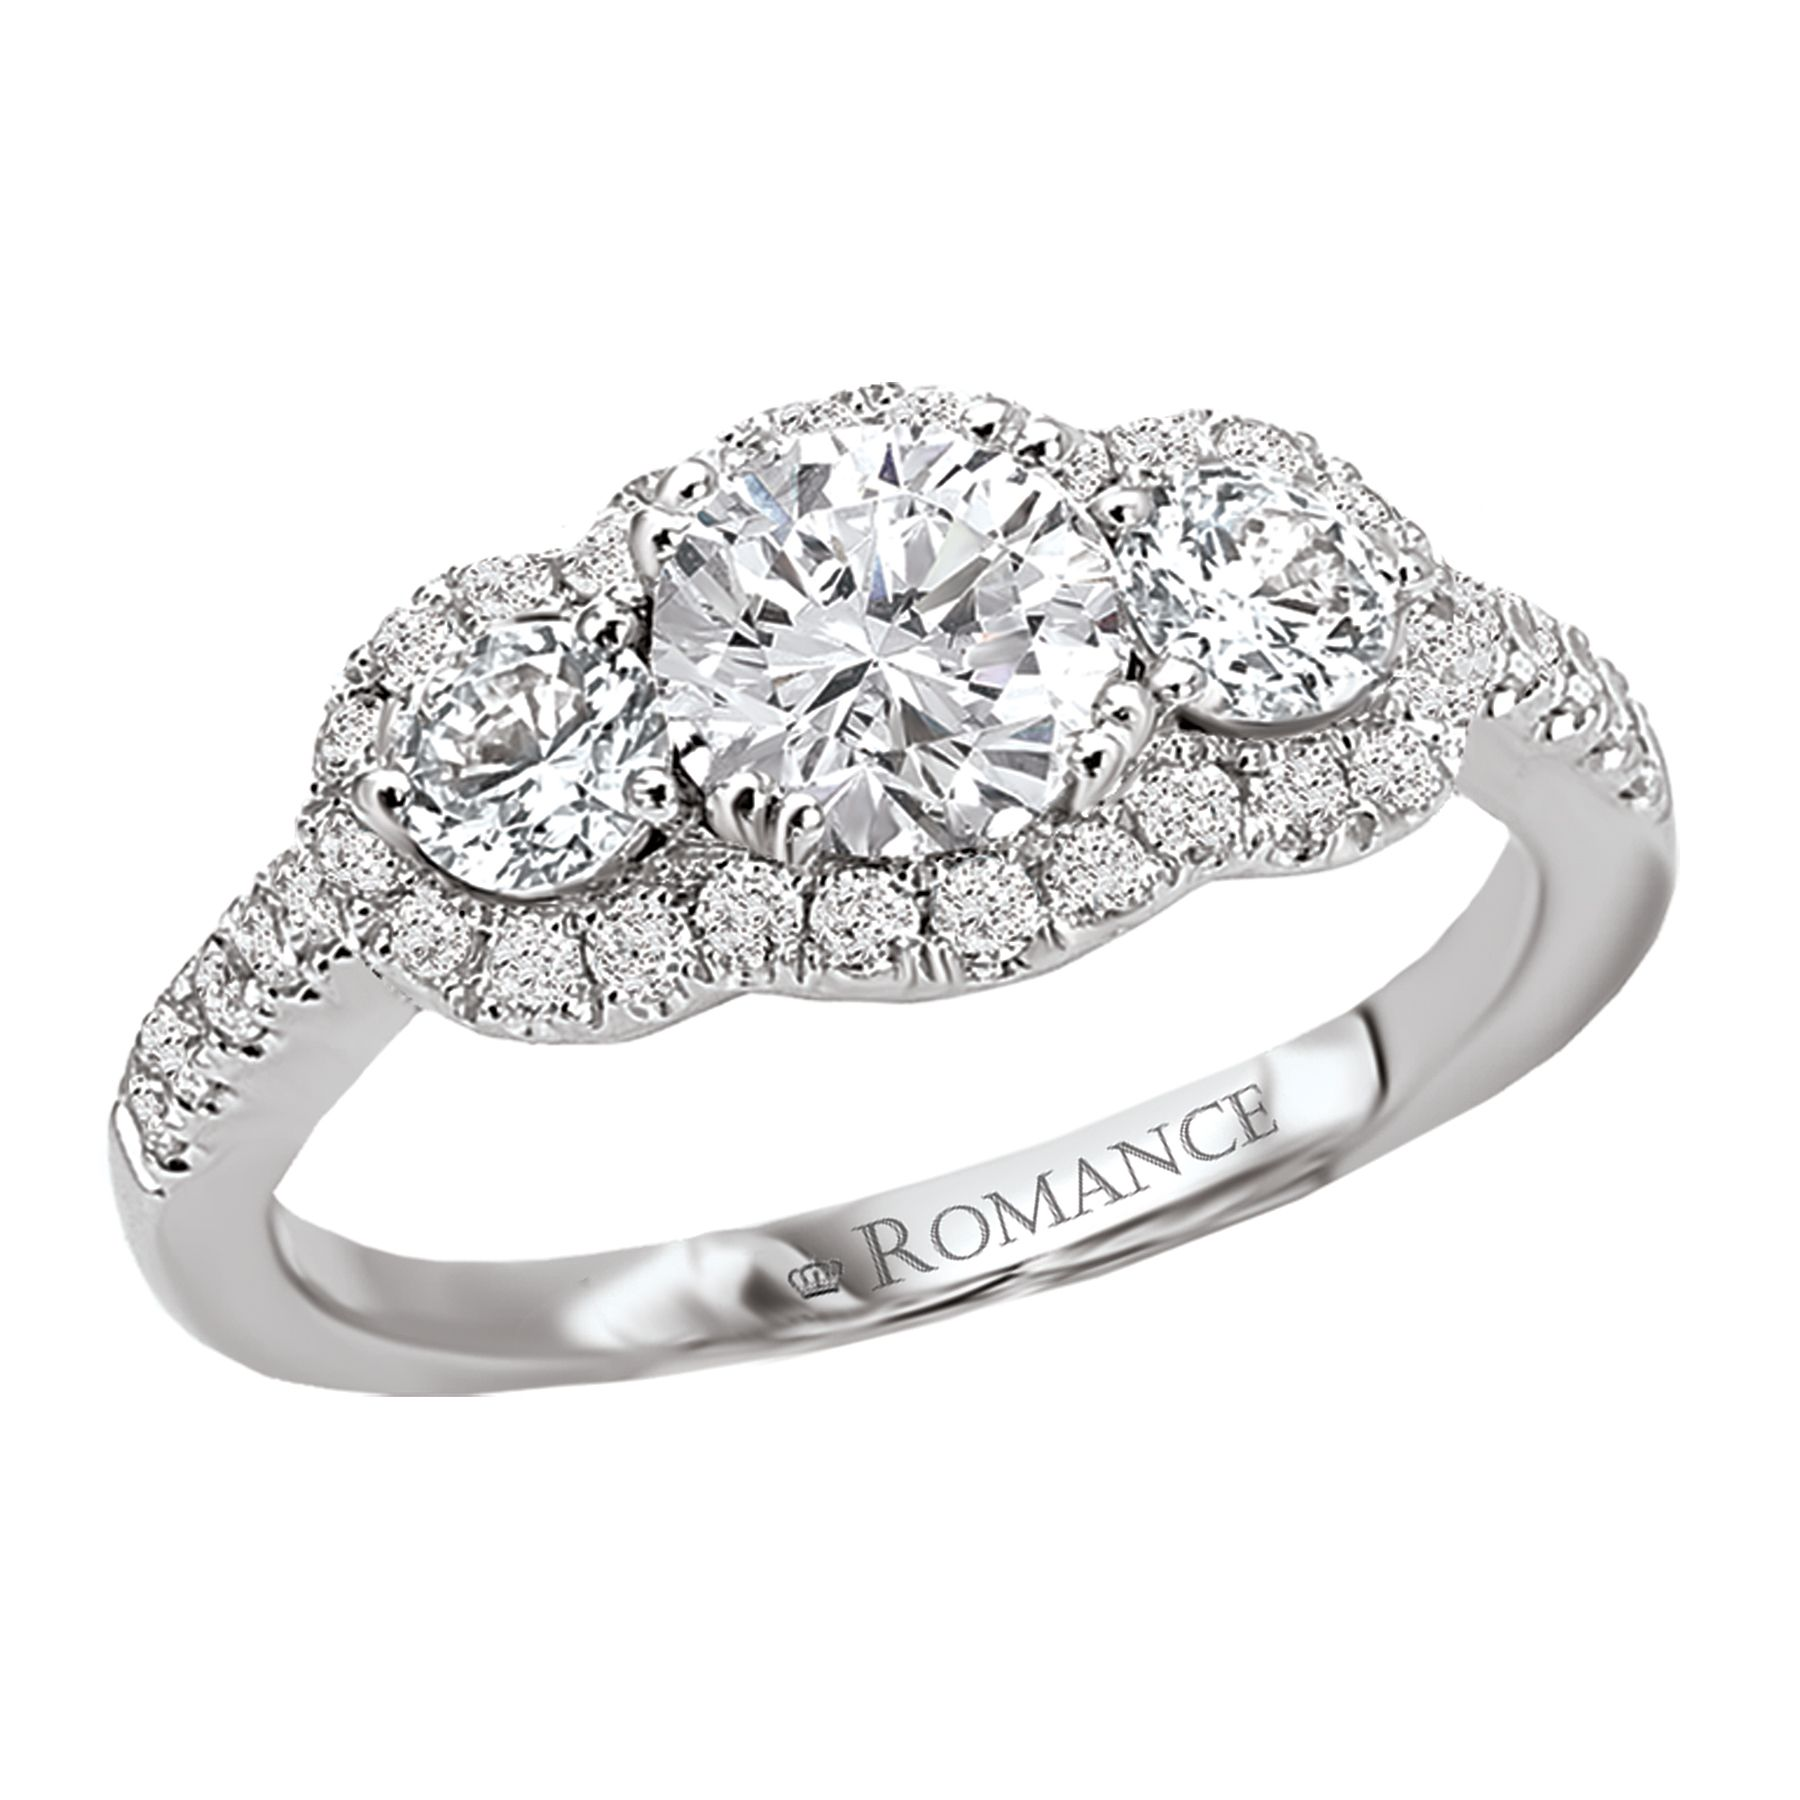 3 stone Diamond Ring romance collection Three stone